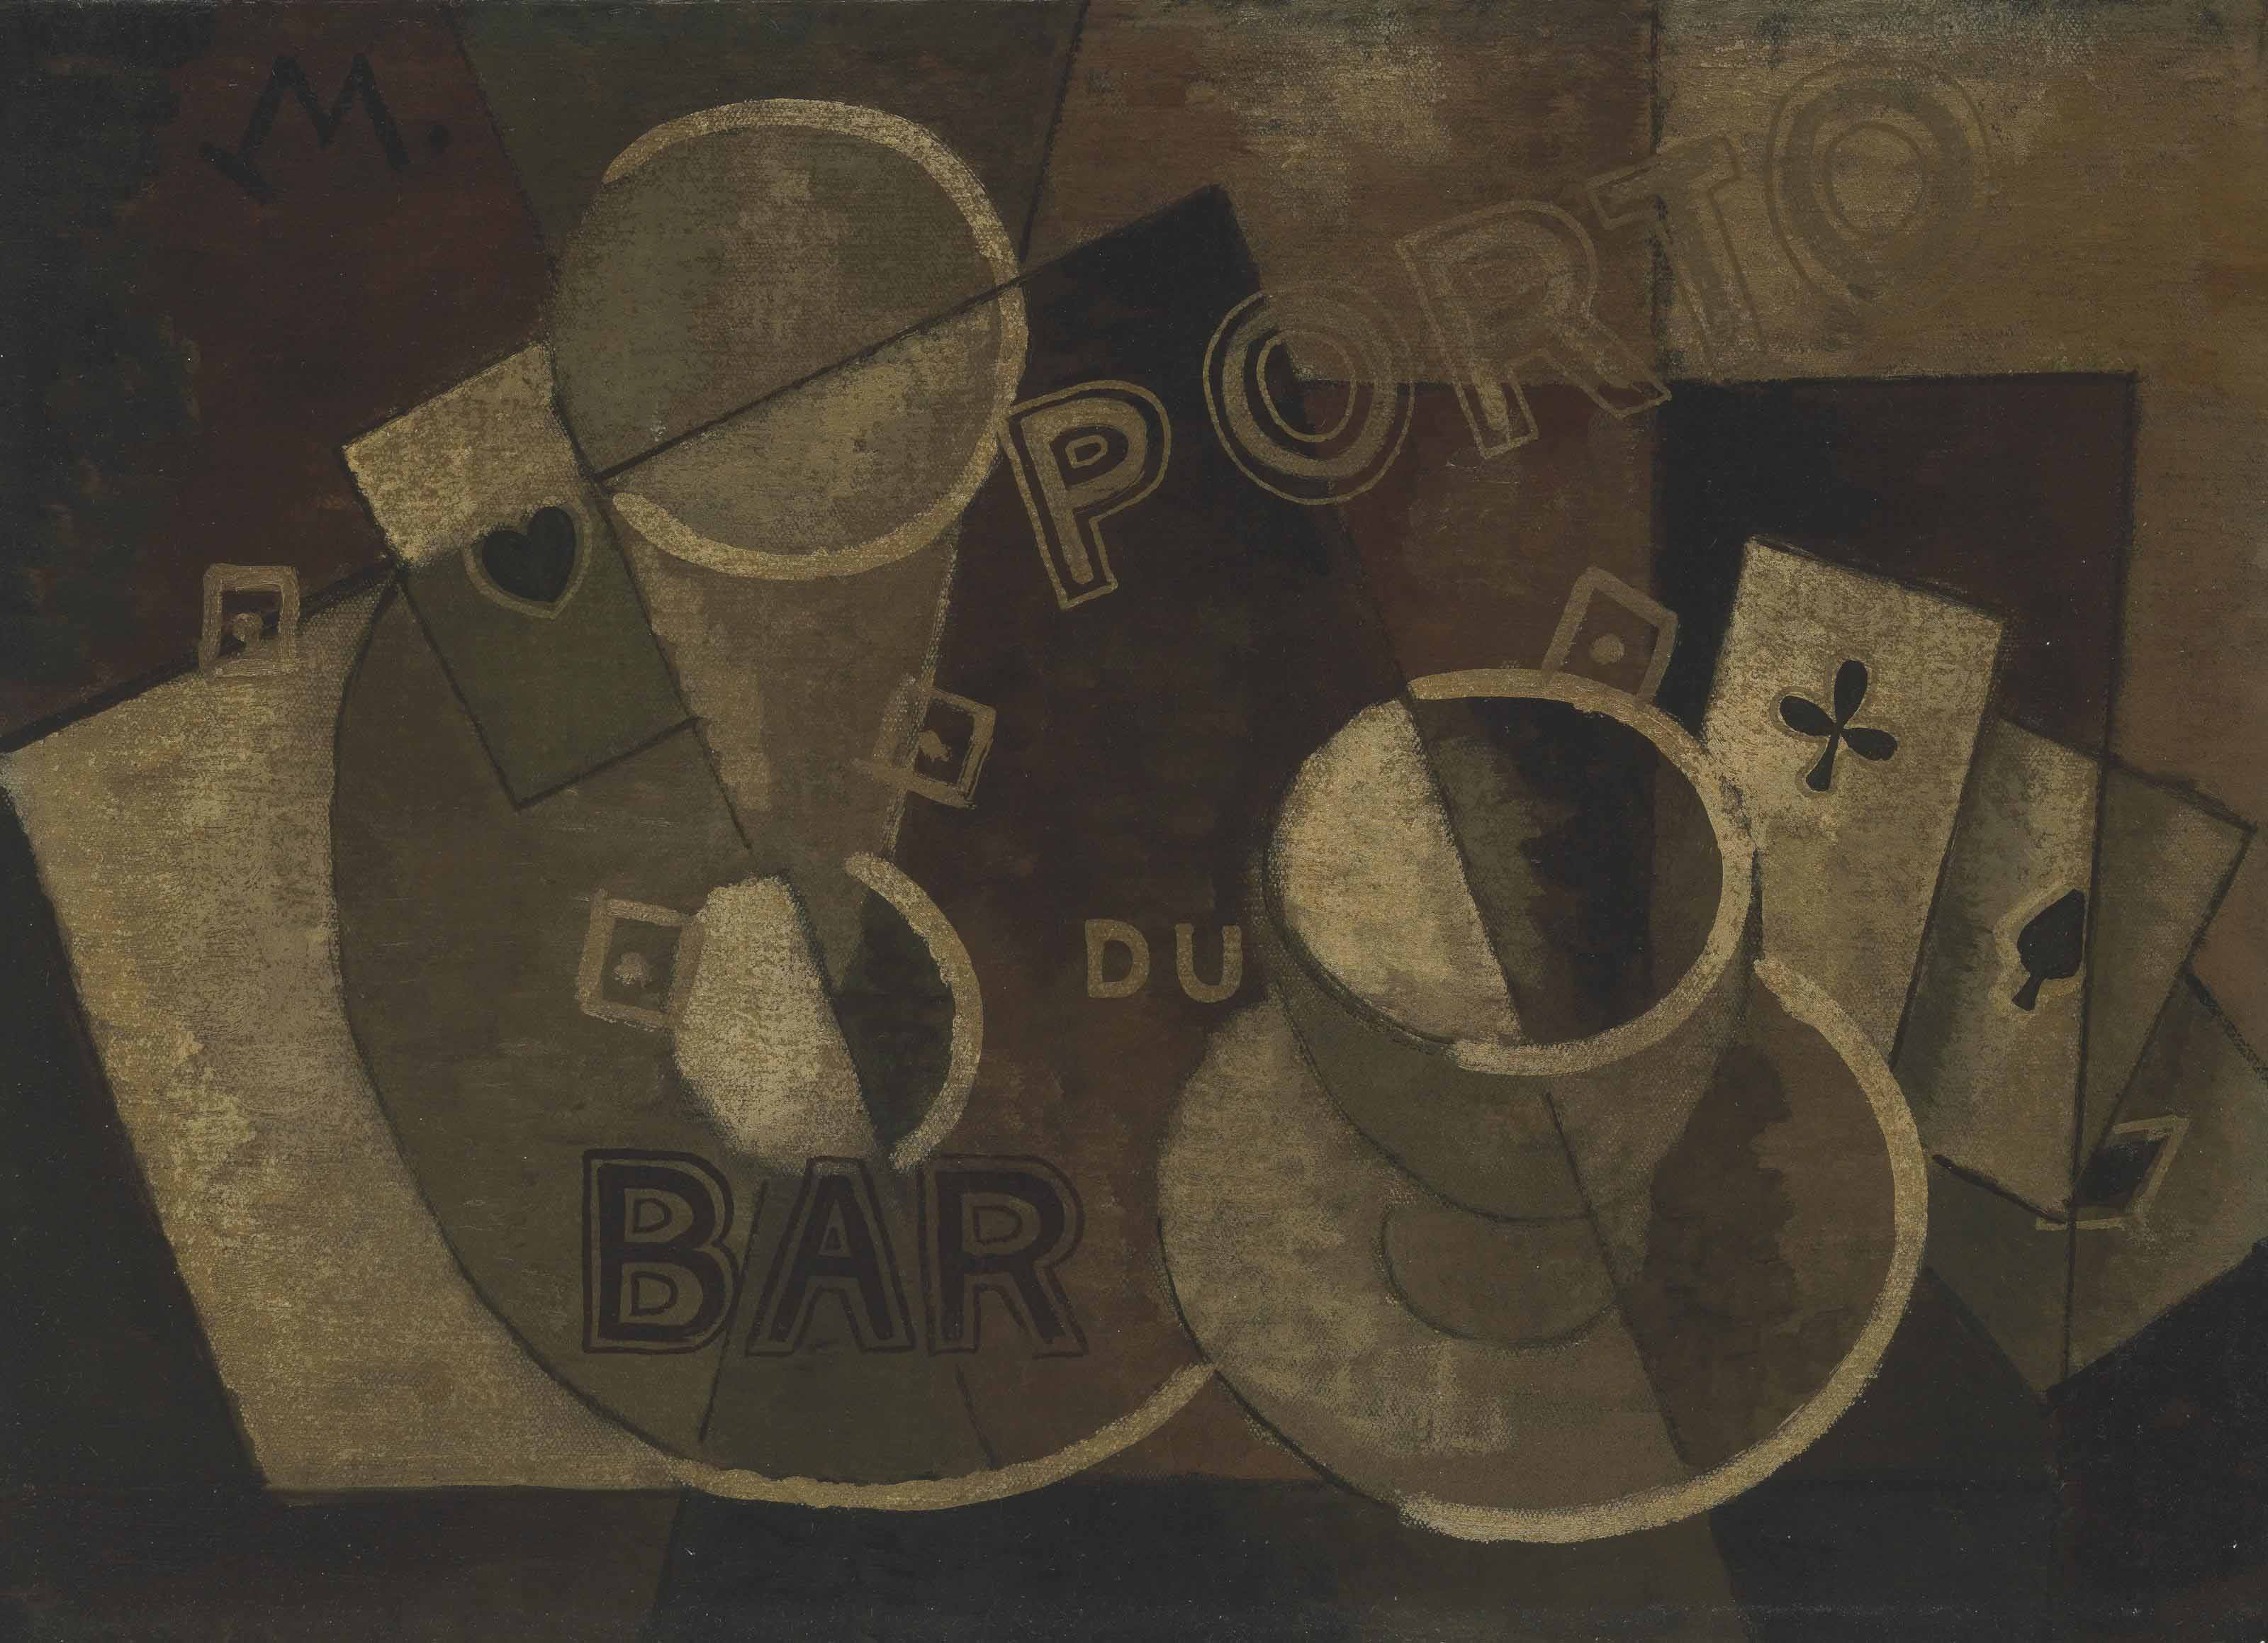 Bar du porto